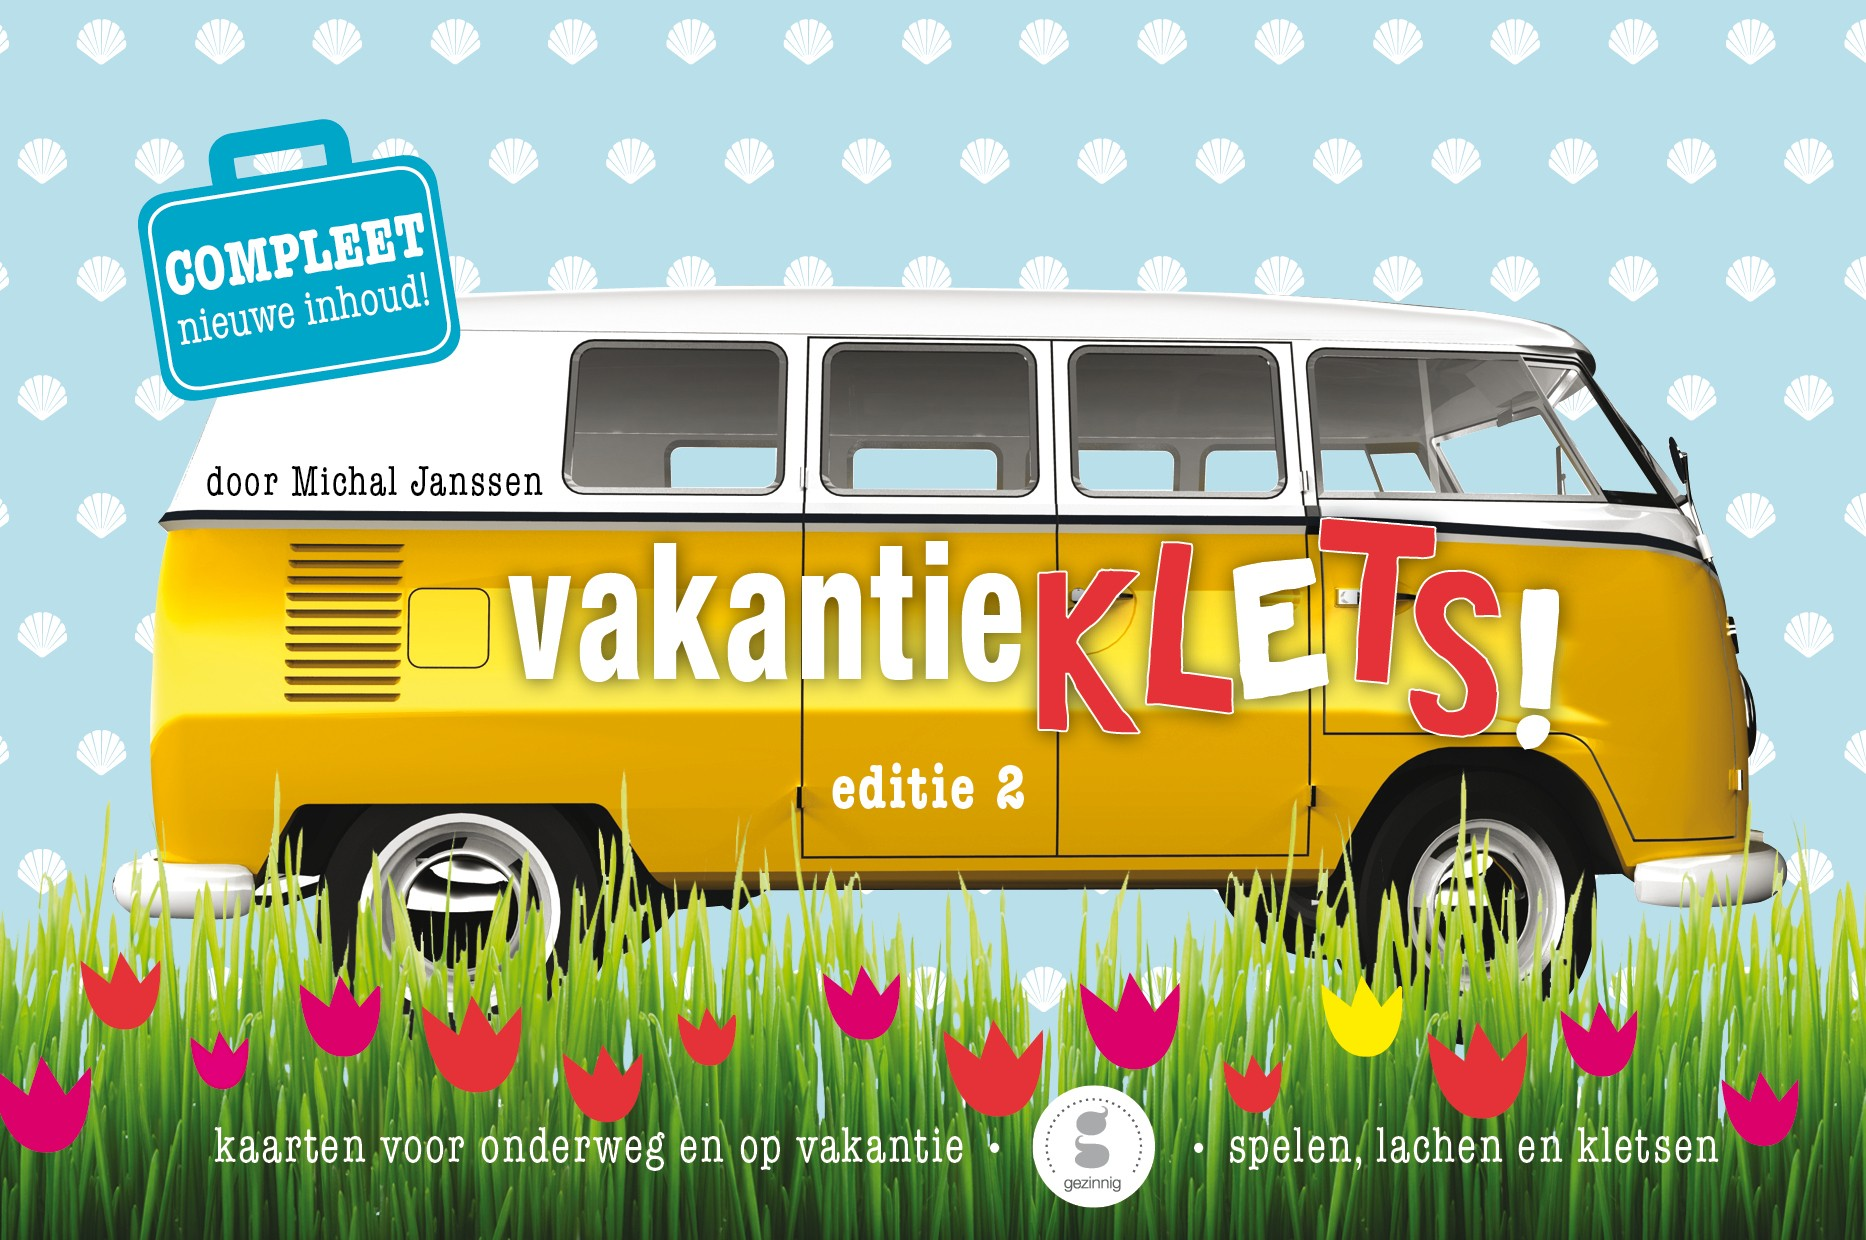 WannaWonders | Gezinnig Kletsboeken | Vakantieklets! editie 2